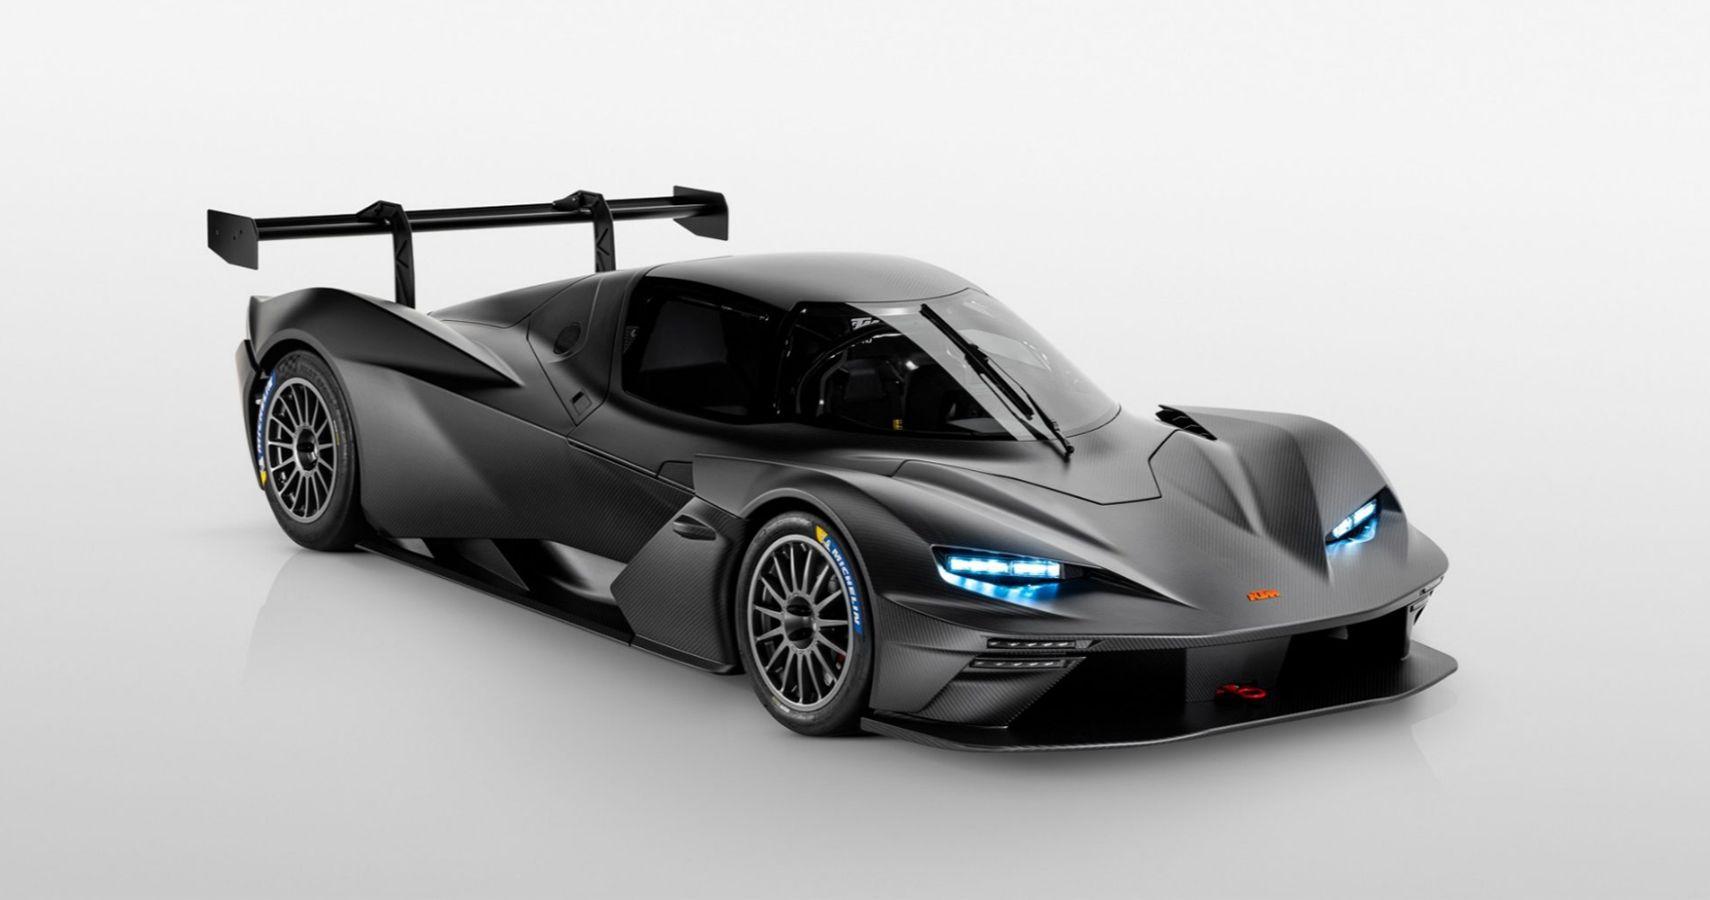 KTM Unveils Full Carbon Fiber X-BOW GTX Race Car With Jet Fighter Canopy